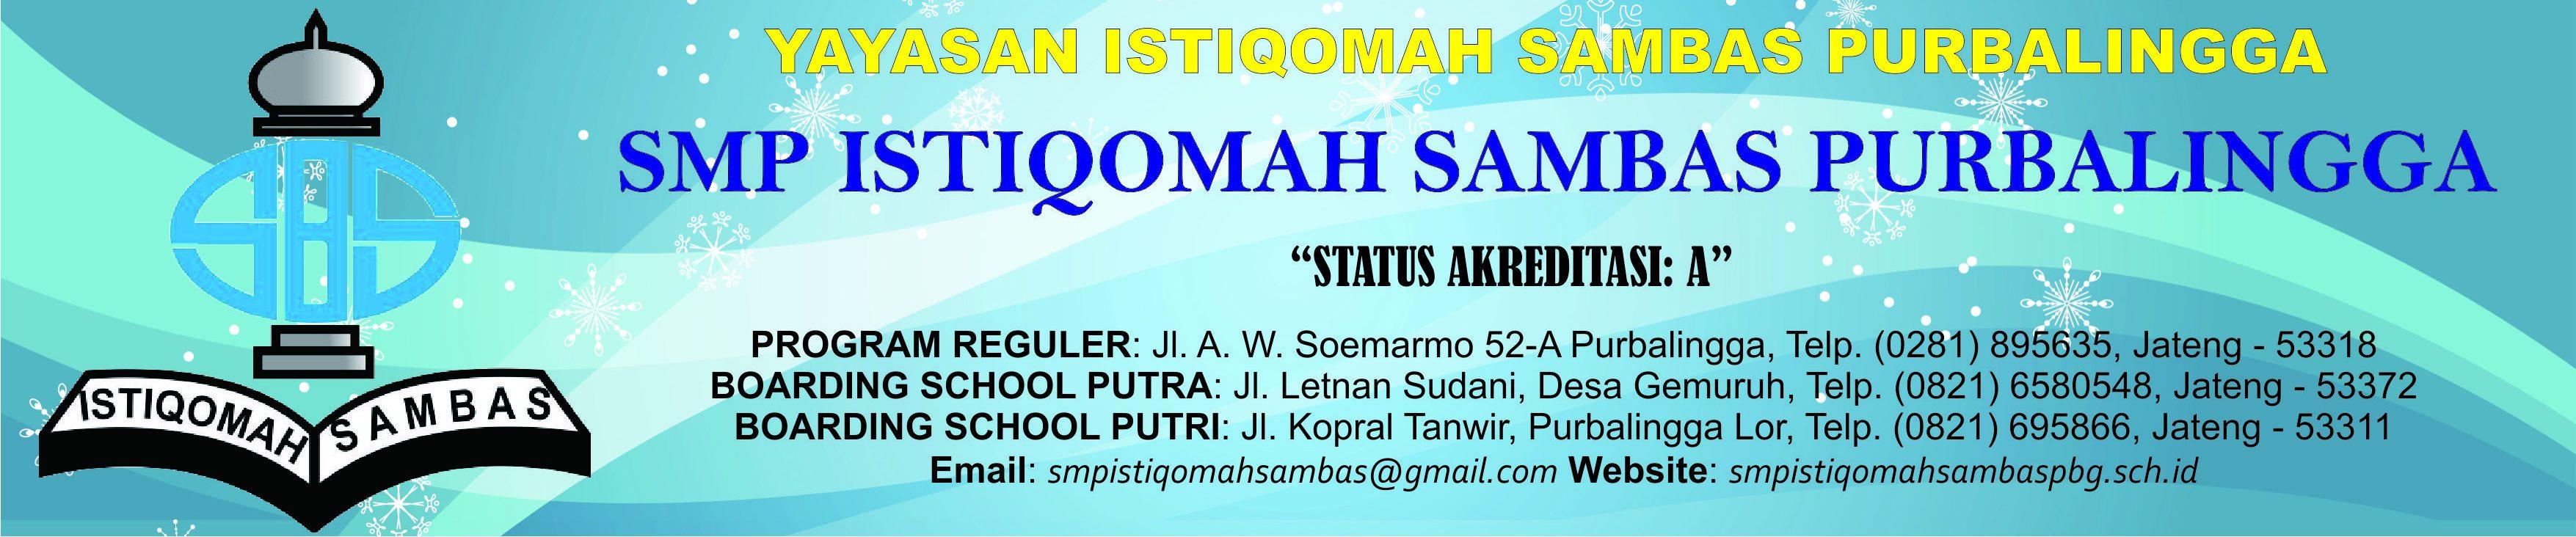 SMP ISTIQOMAH SAMBAS PURBALINGGA